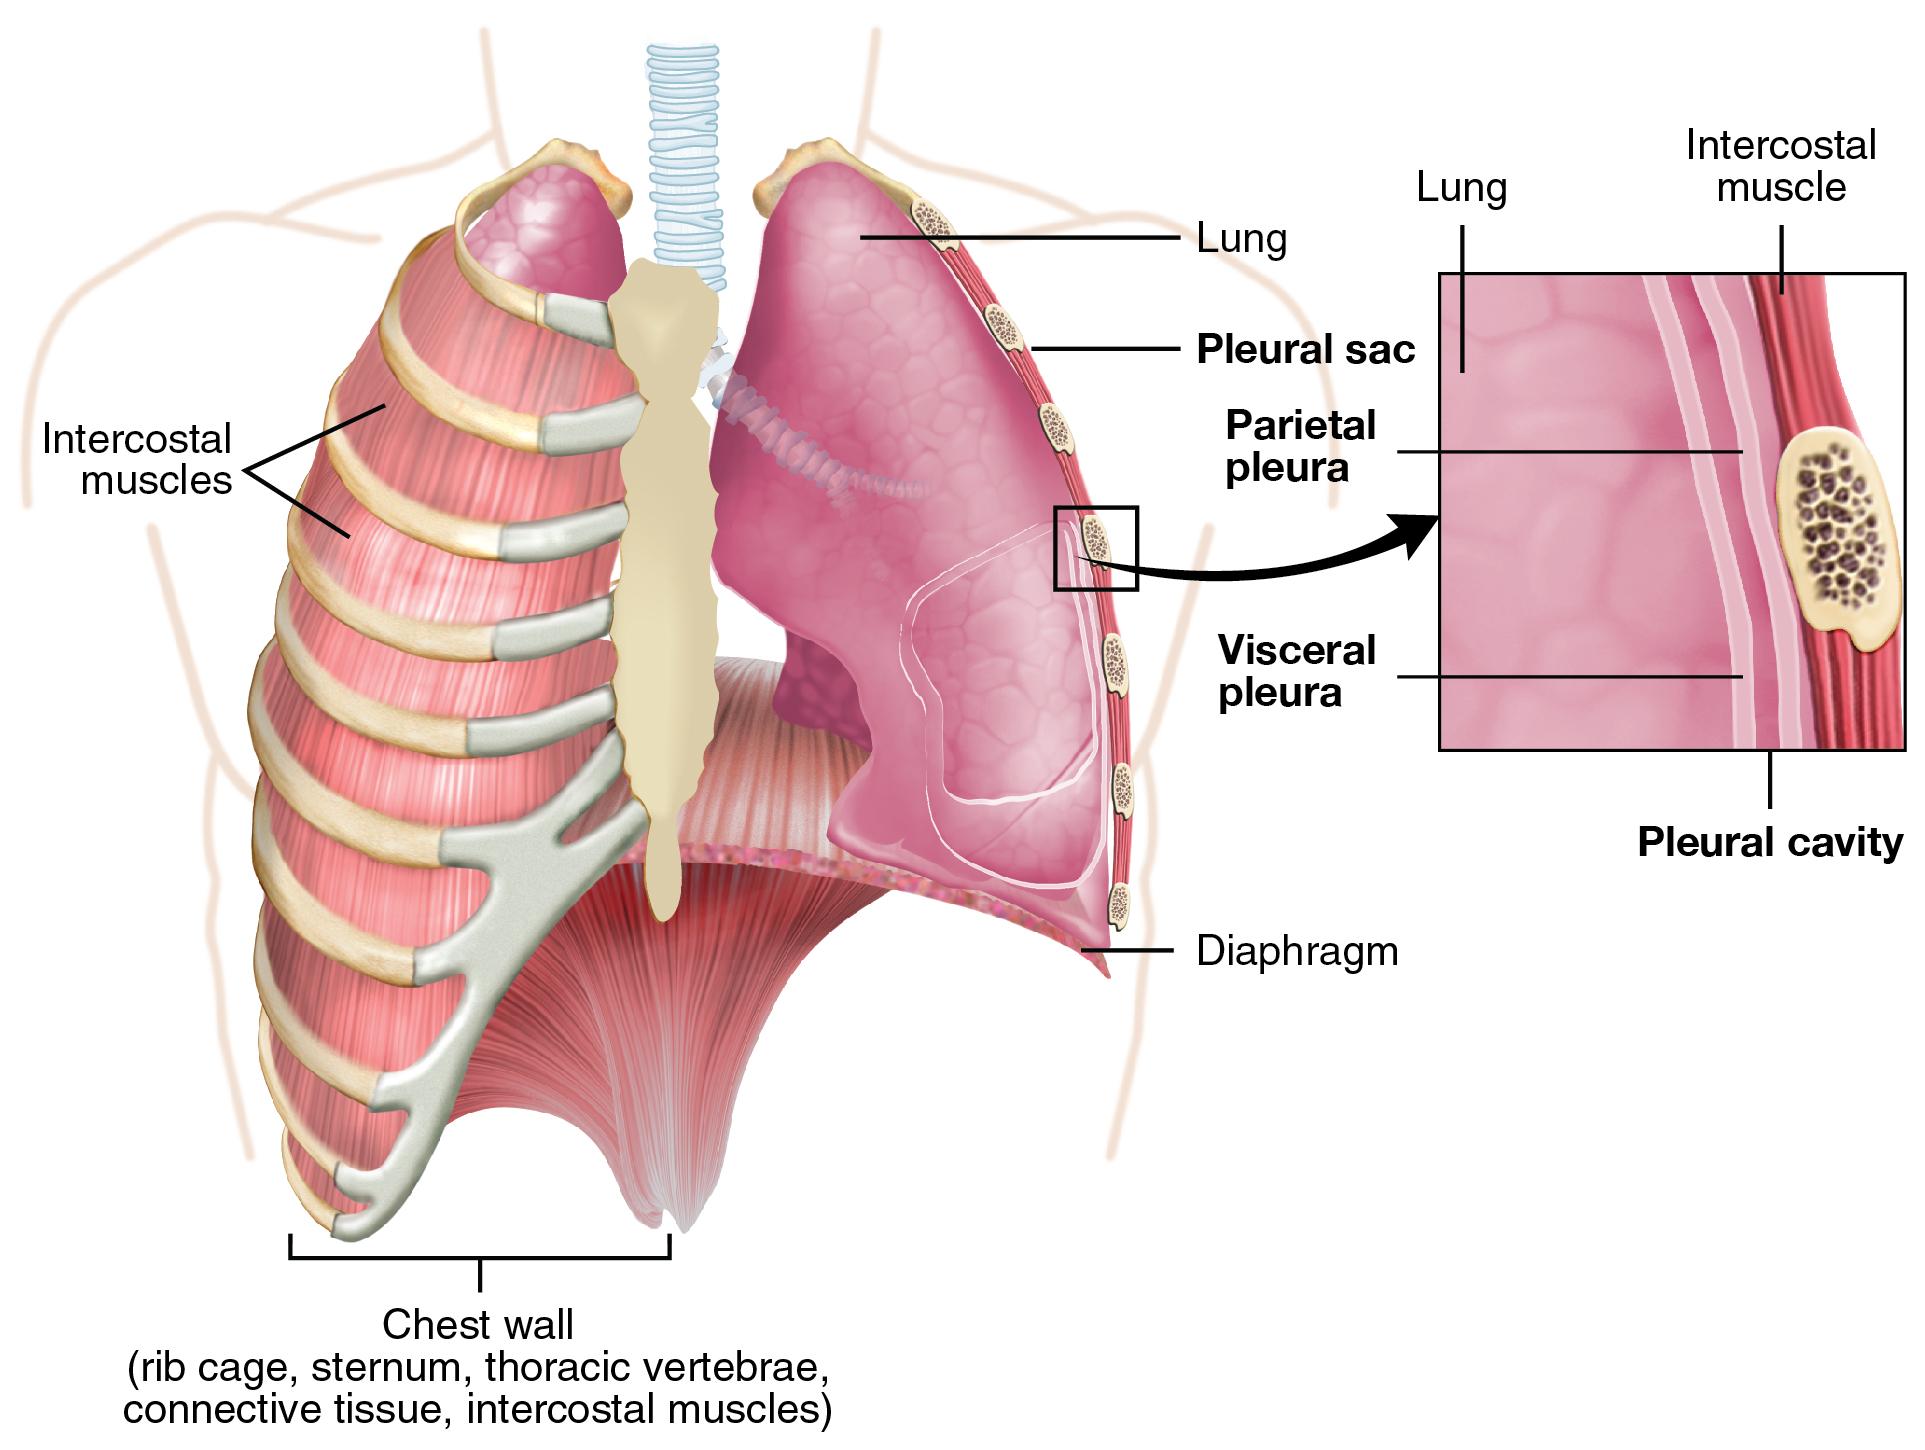 Parietal and visceral pleurae of the lungs. Image description available.